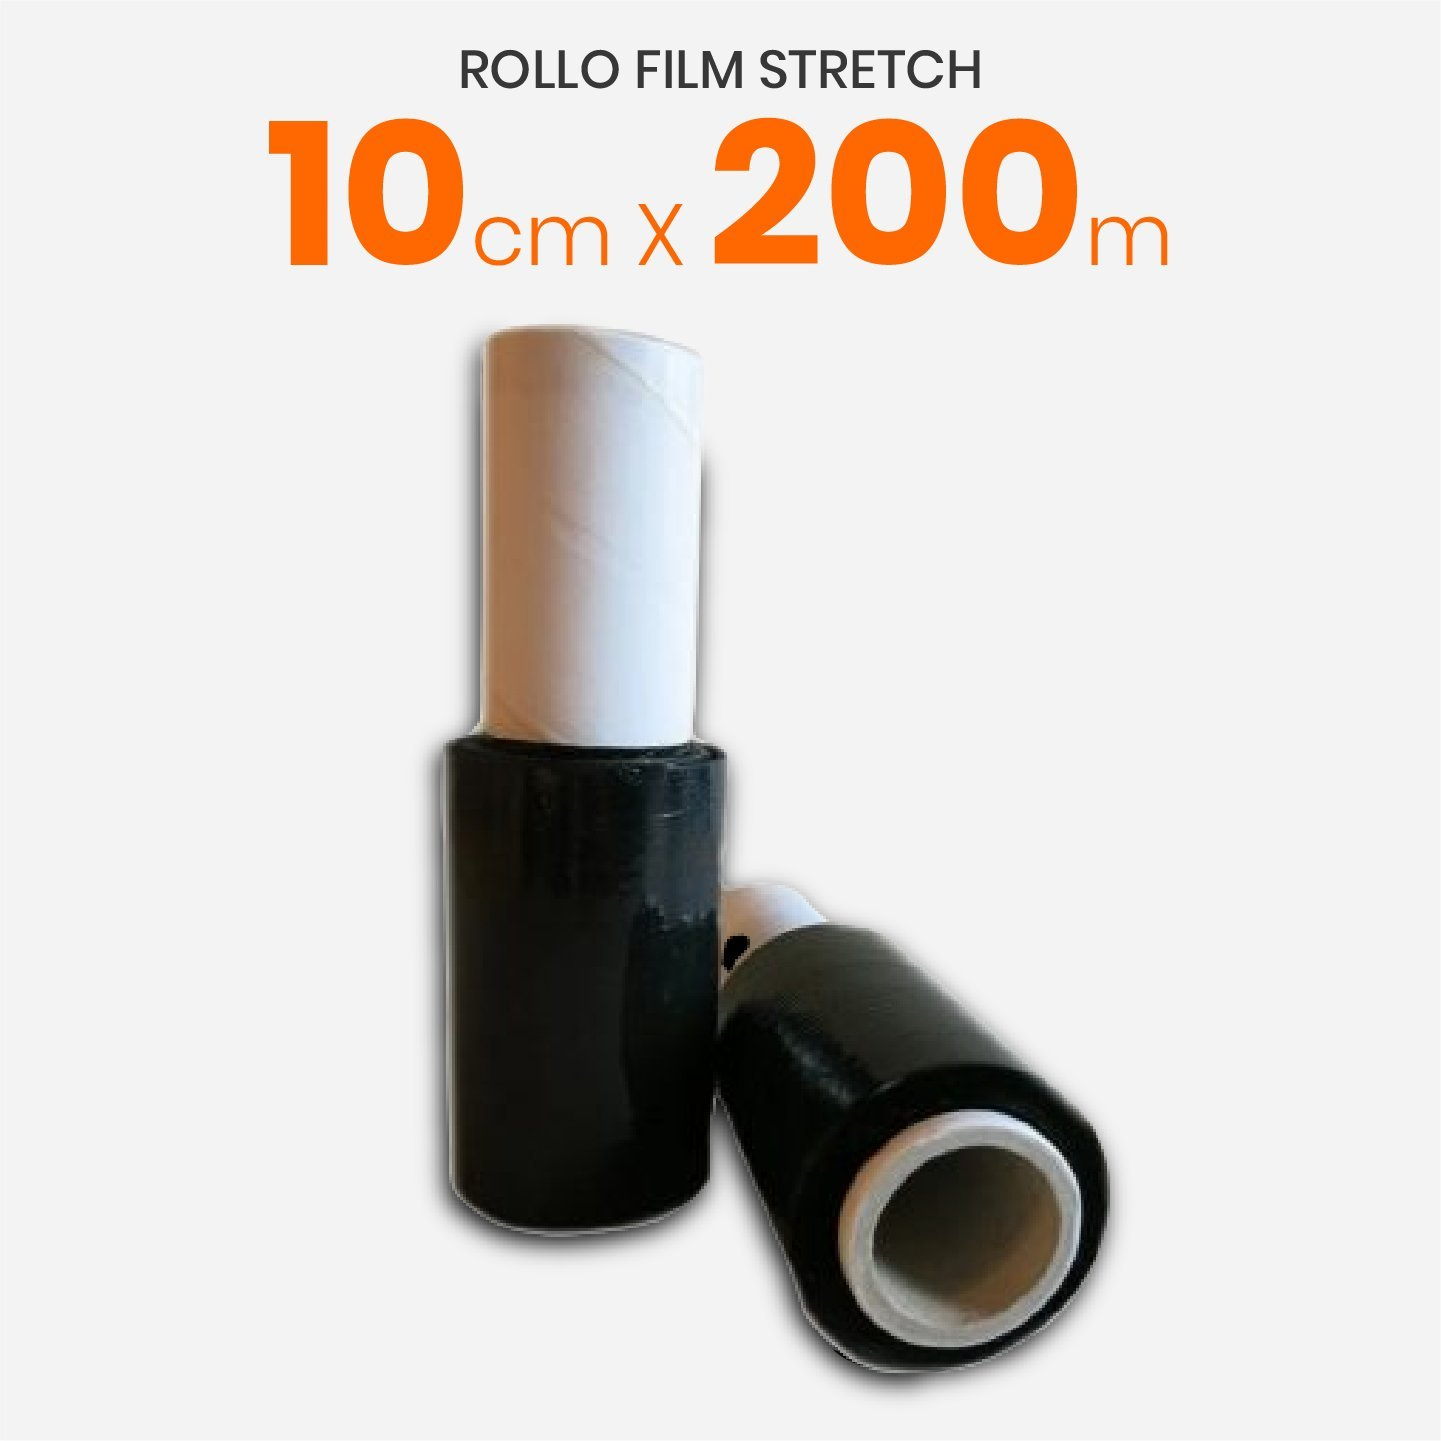 Rollo Film Stretch Virgen Negro Reforzado Con Mango 10cm x 200mts